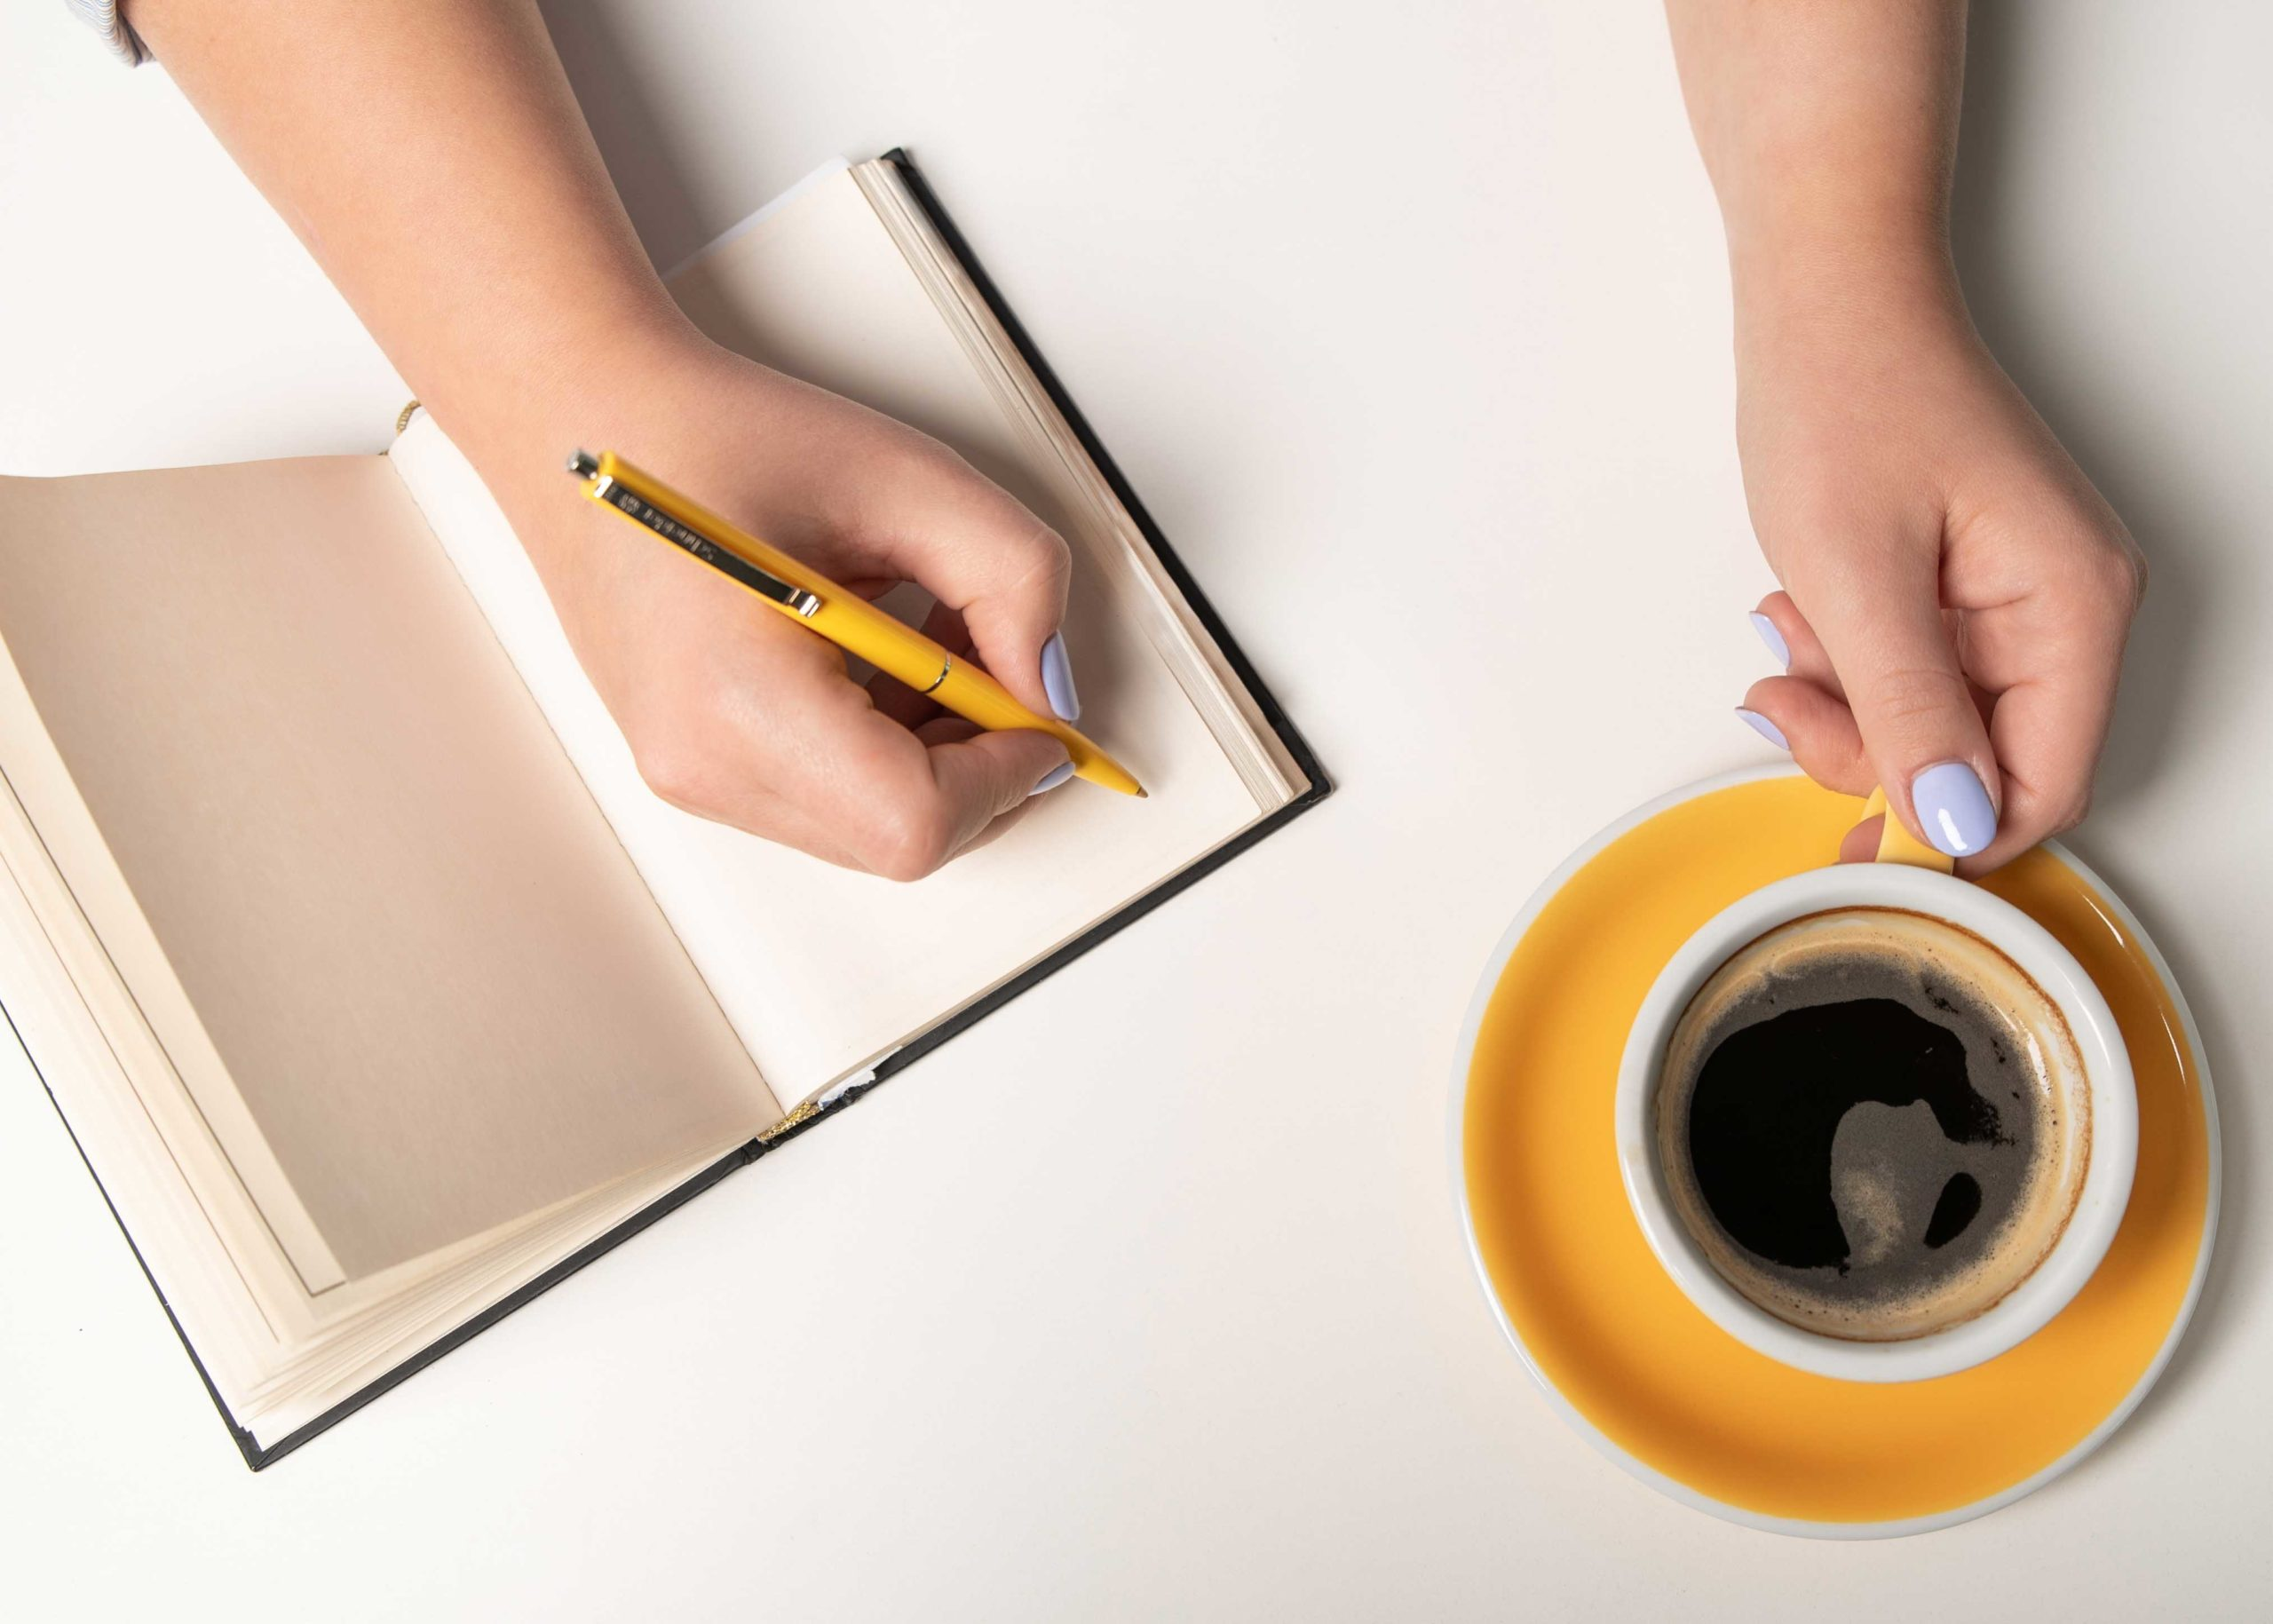 Tips how to choose grinder